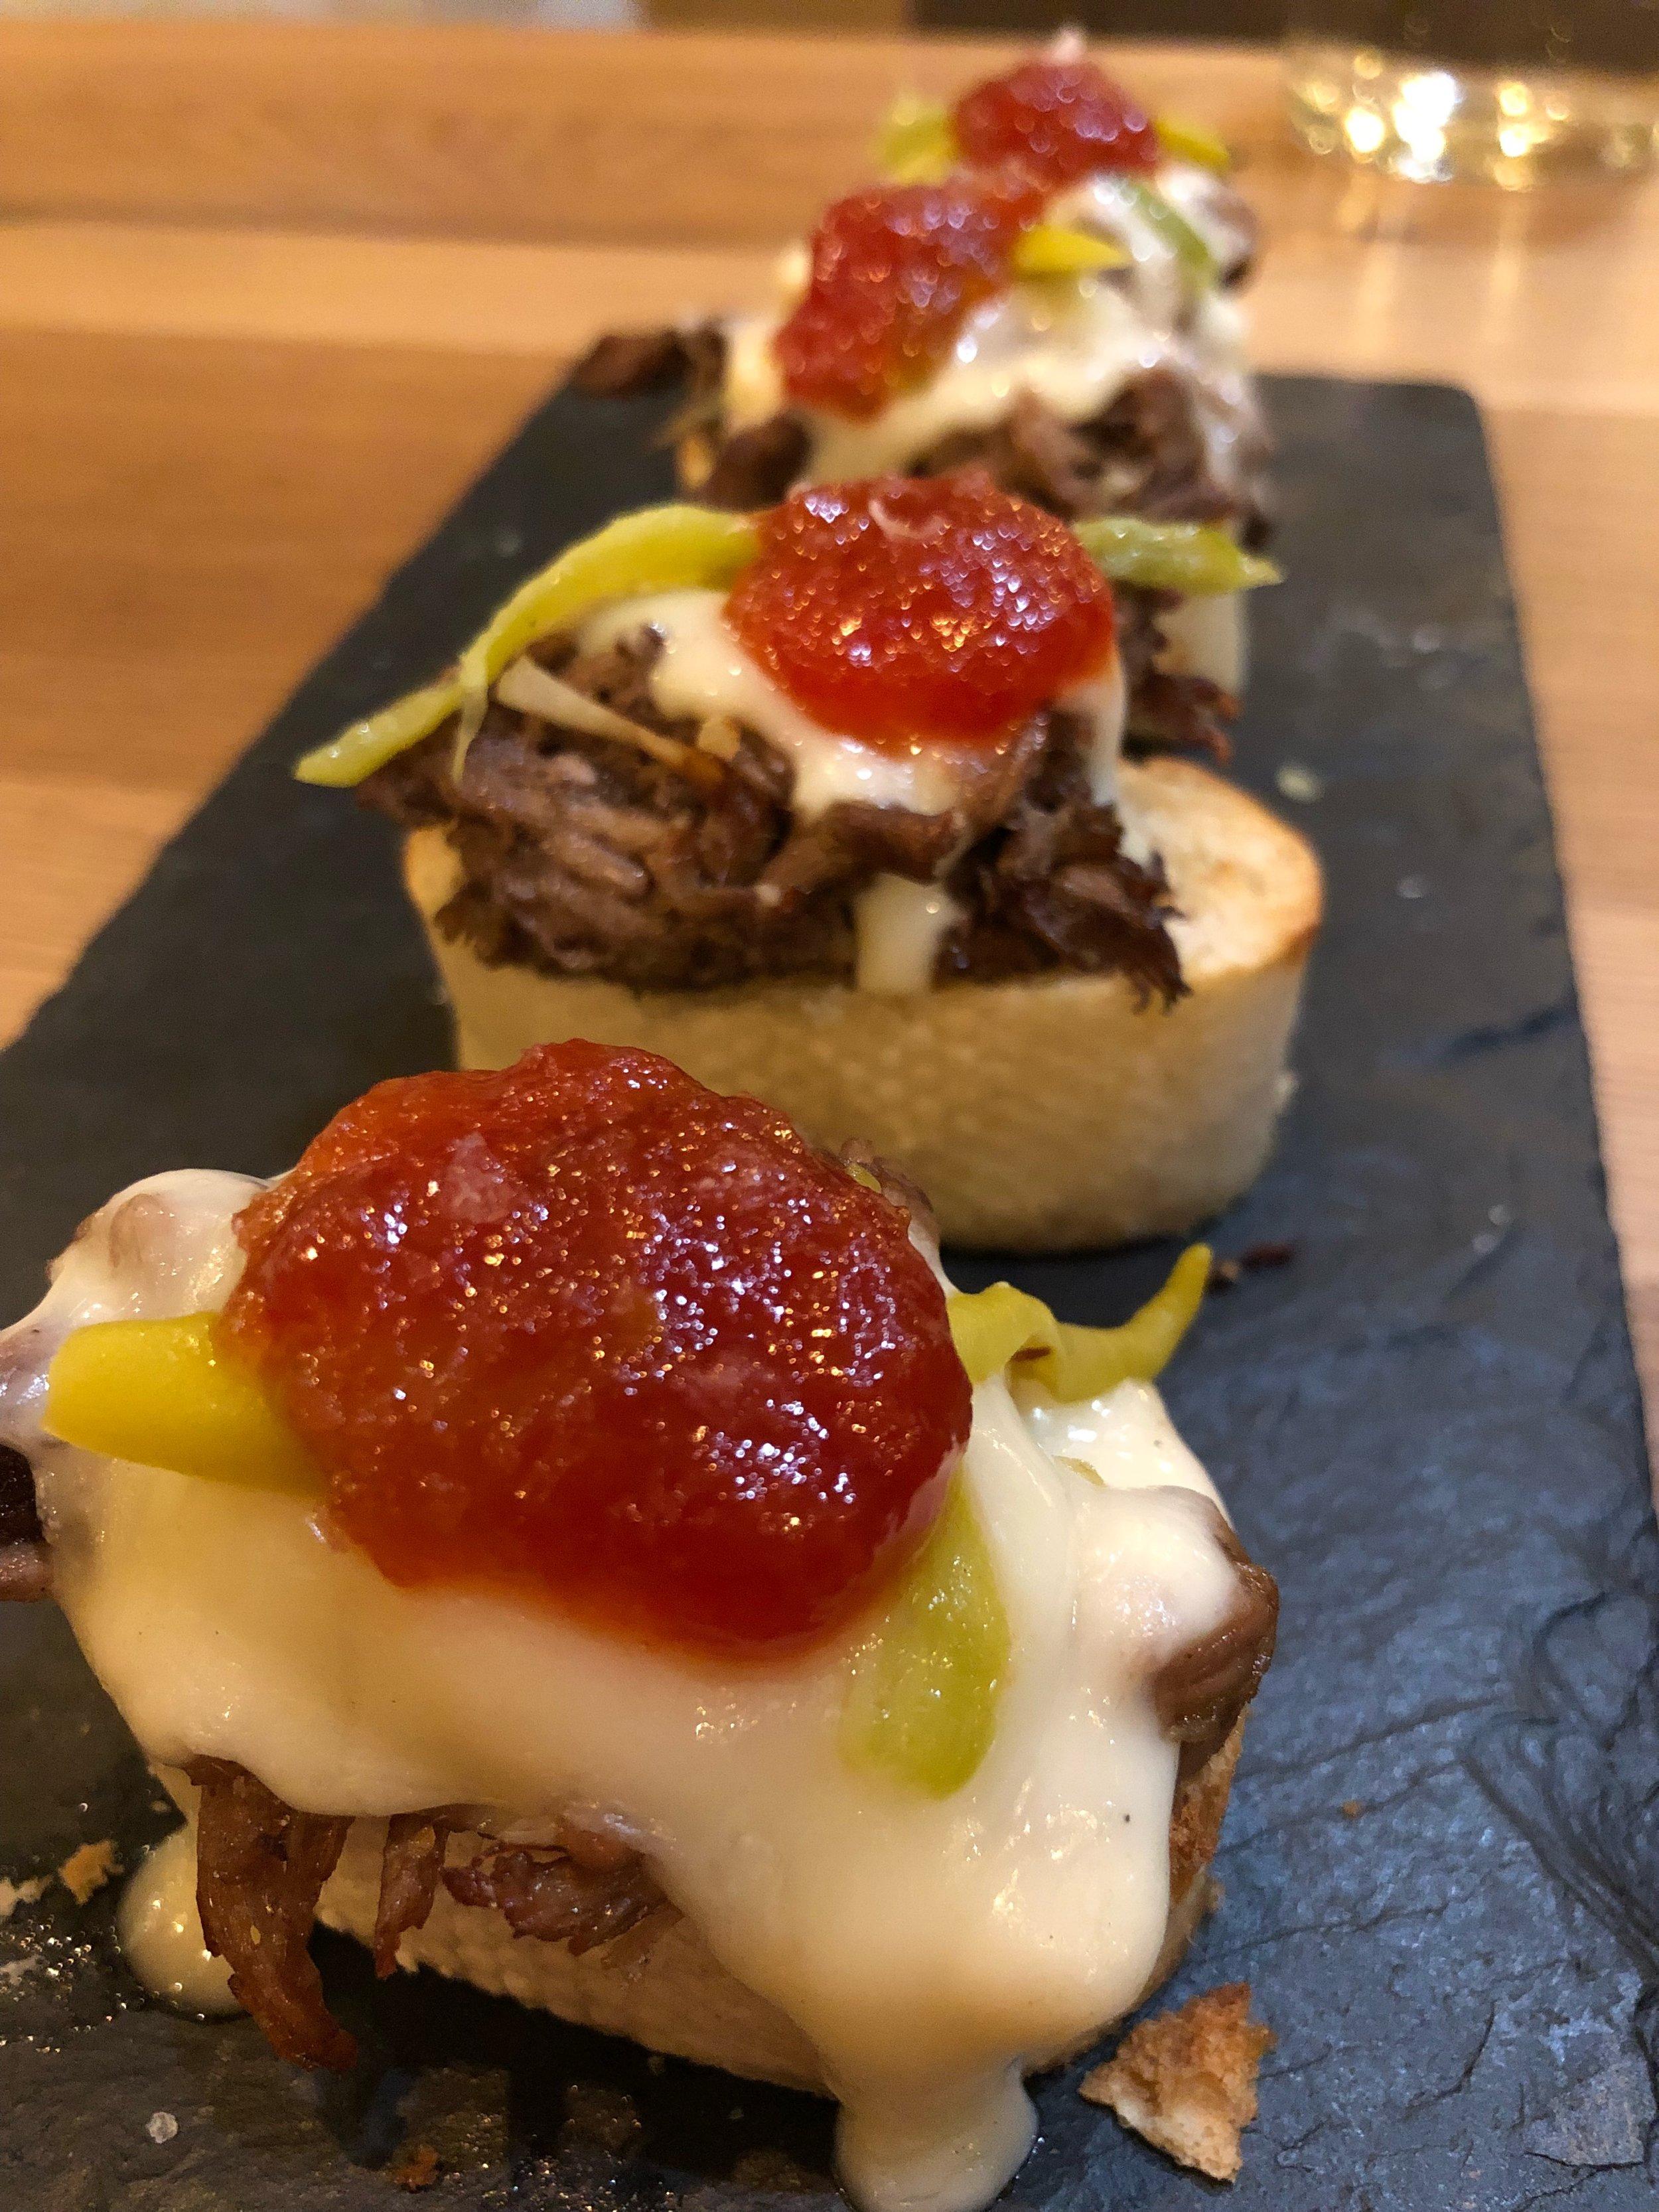 MONTADITOS - Brisket, tomato marmalade, guindilla, tetilla cheeseSuper delicious little bites. We would order these again.